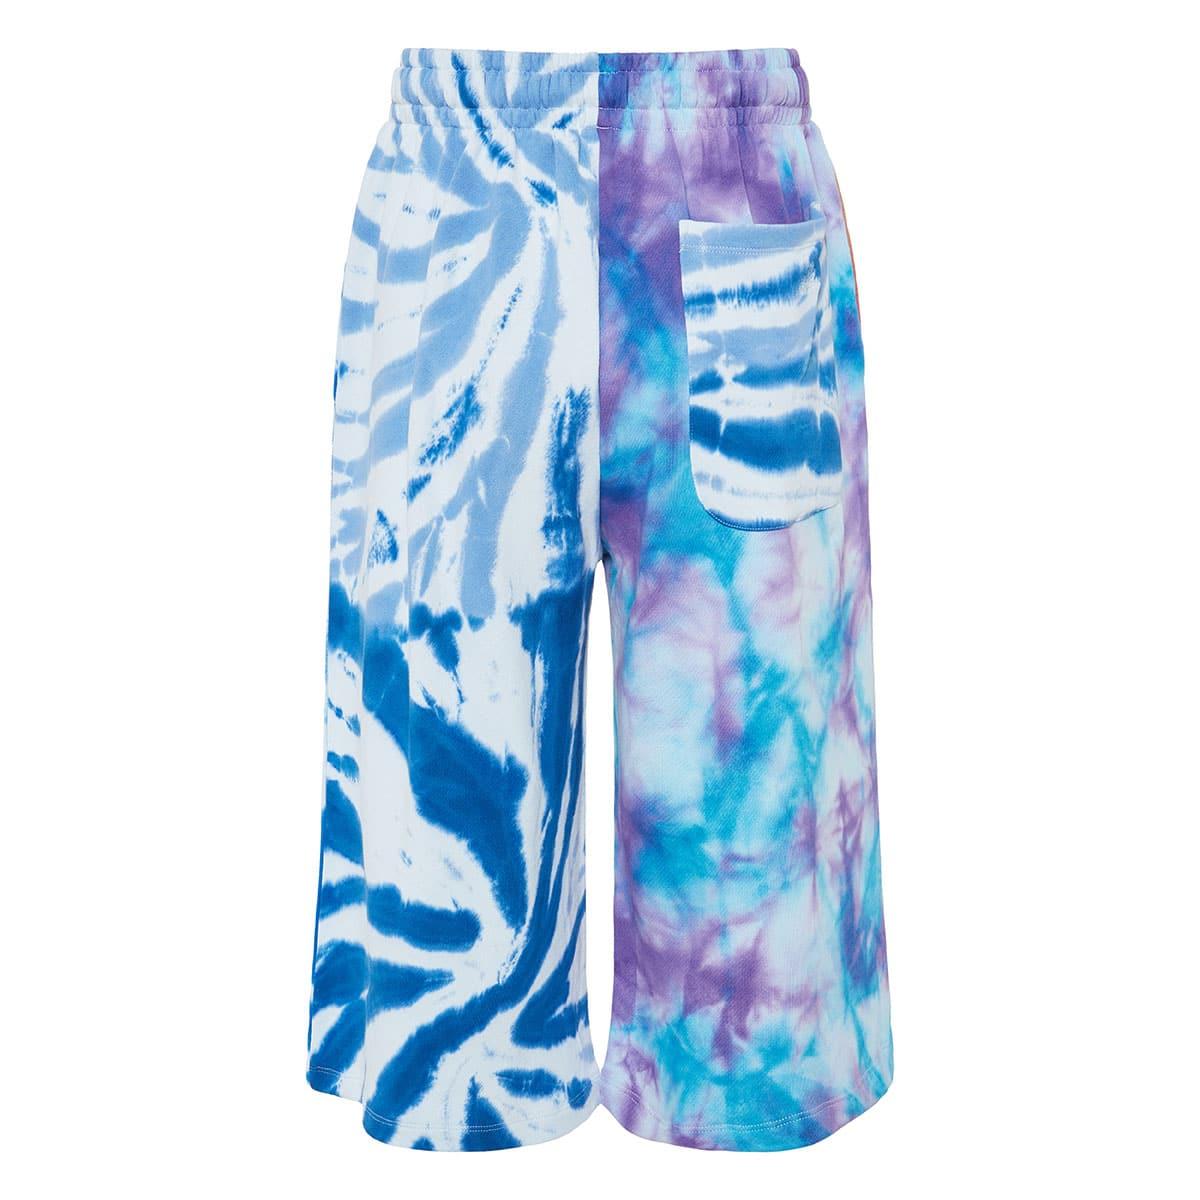 Tie-dye patchwork track shorts